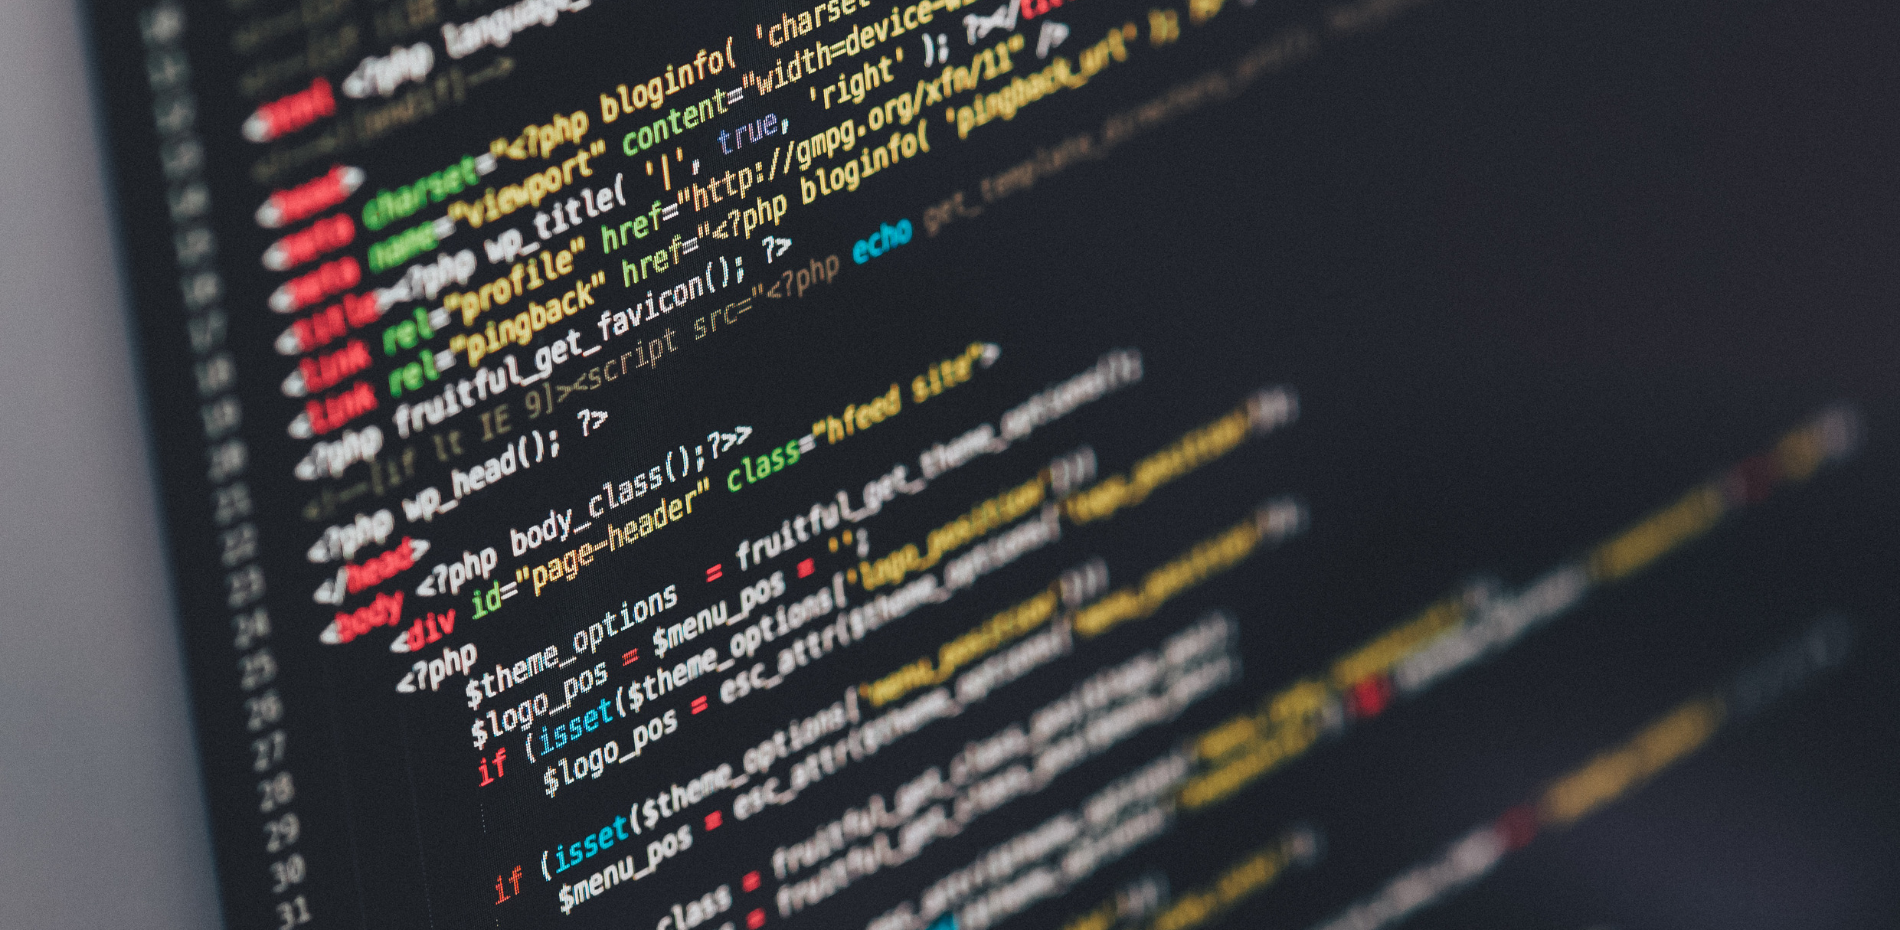 Lap top computer displaying html code